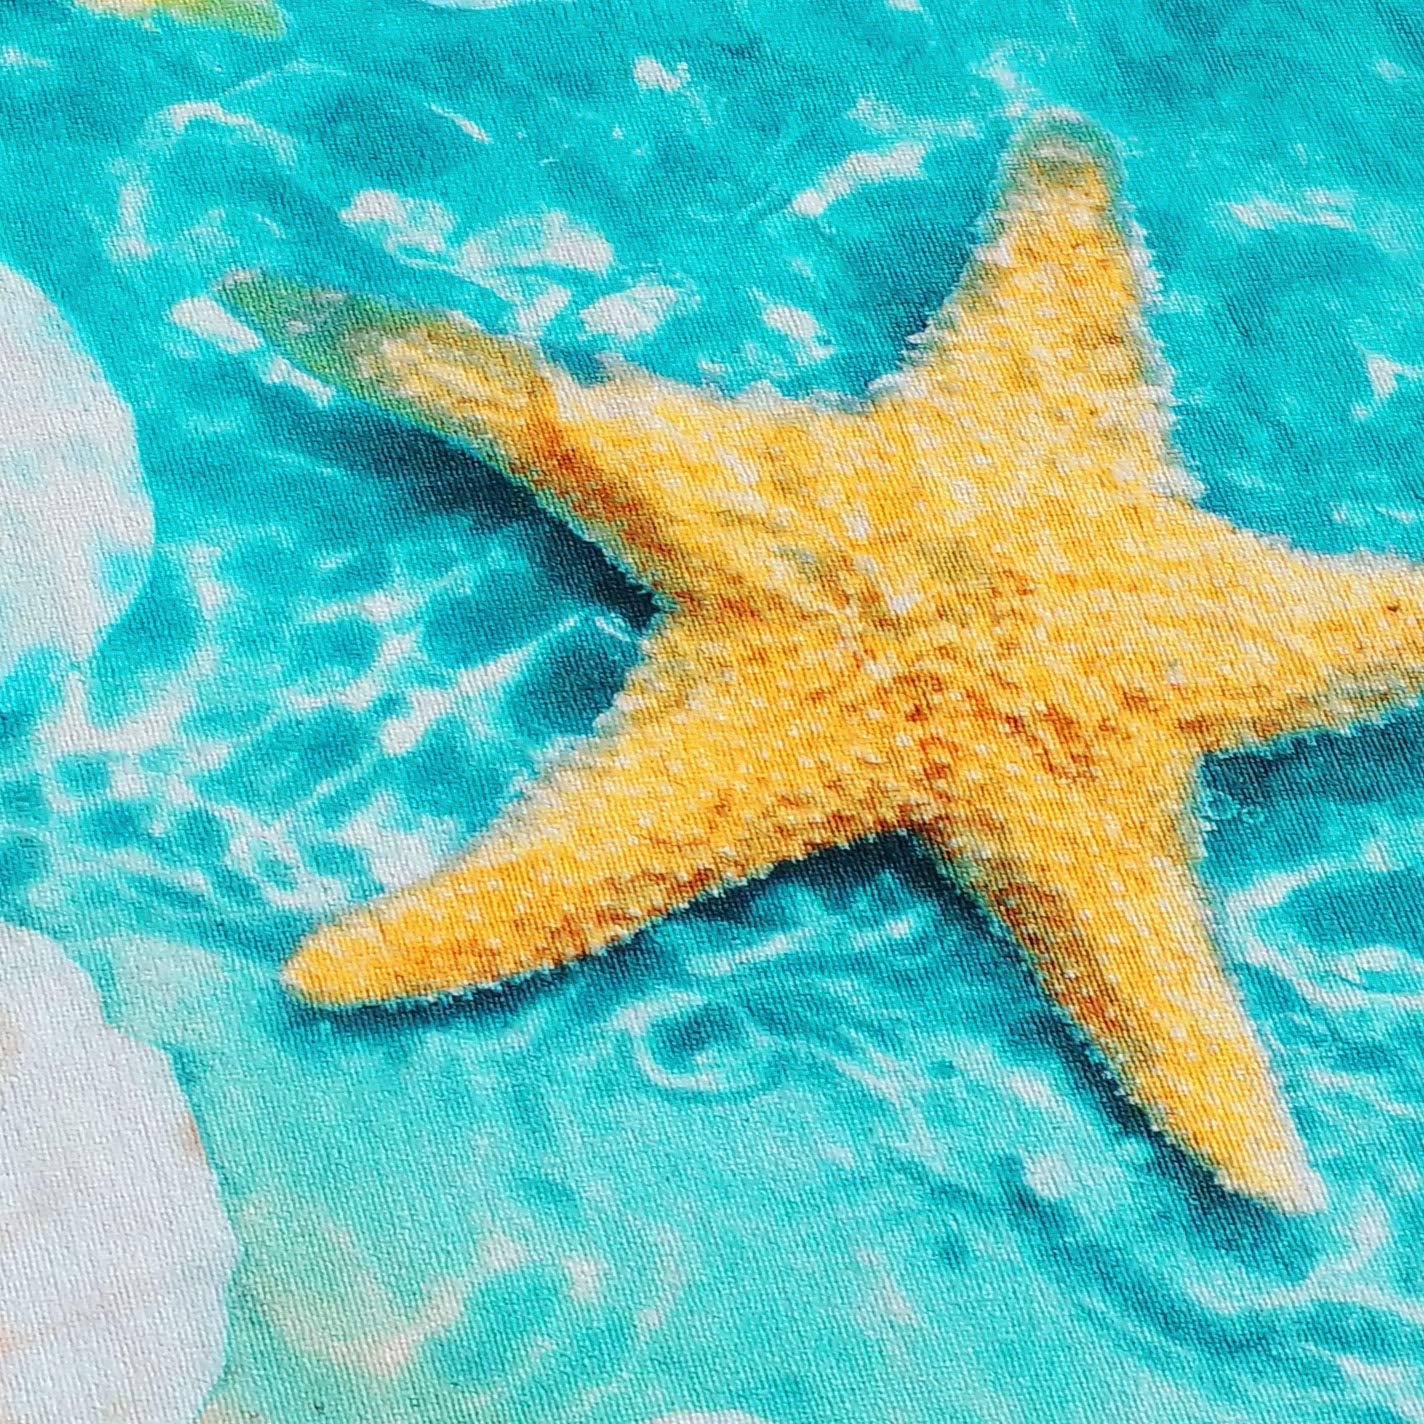 Blue and Sand Starfish /& Seashells Beach Towel 30 x 60 inch Velour Terry 100/% Cotton